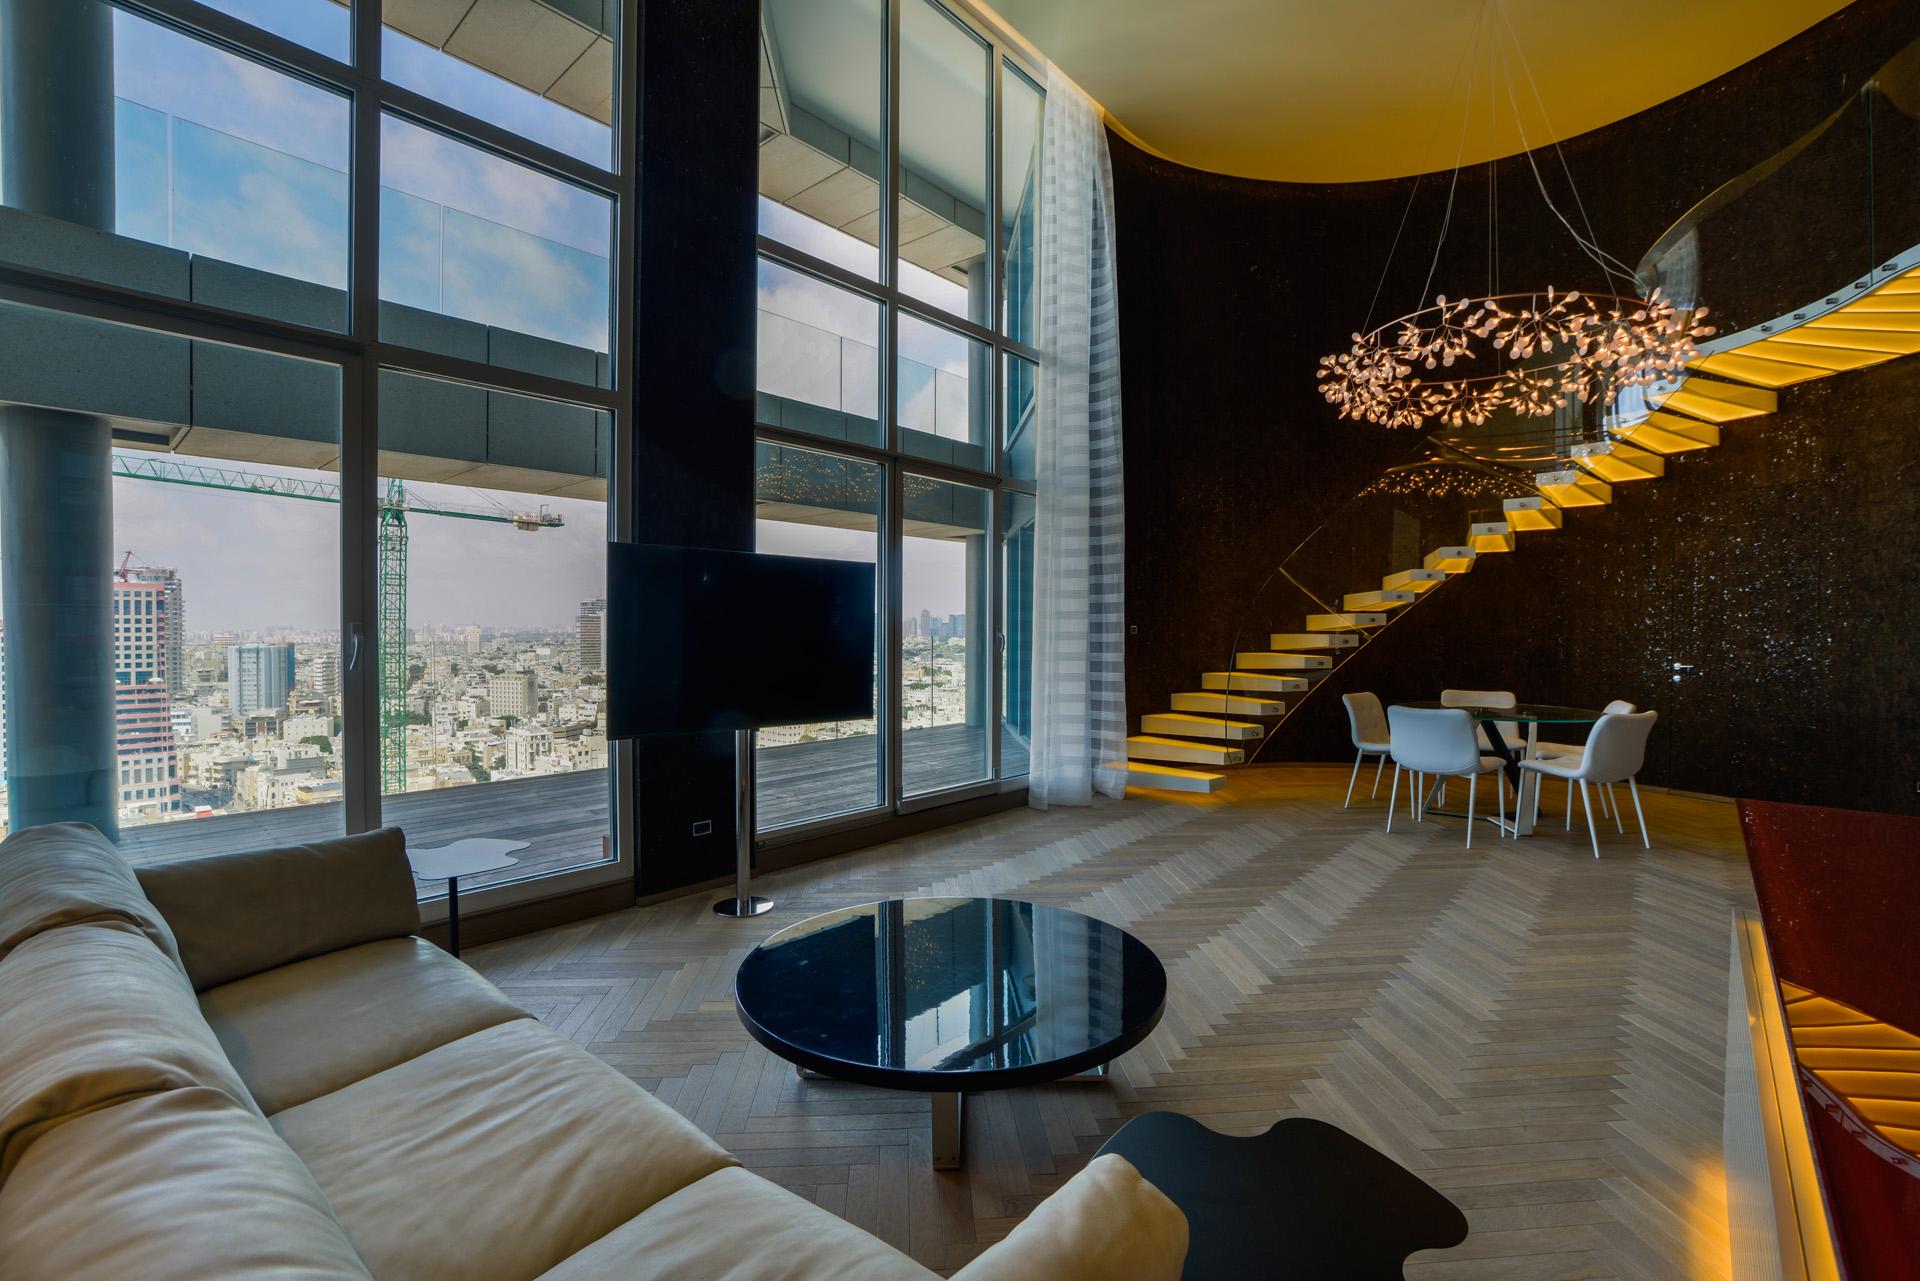 дуплекс для того Продажа на Breathtaking view Duplex at Sea One Tel Aviv, Израиль